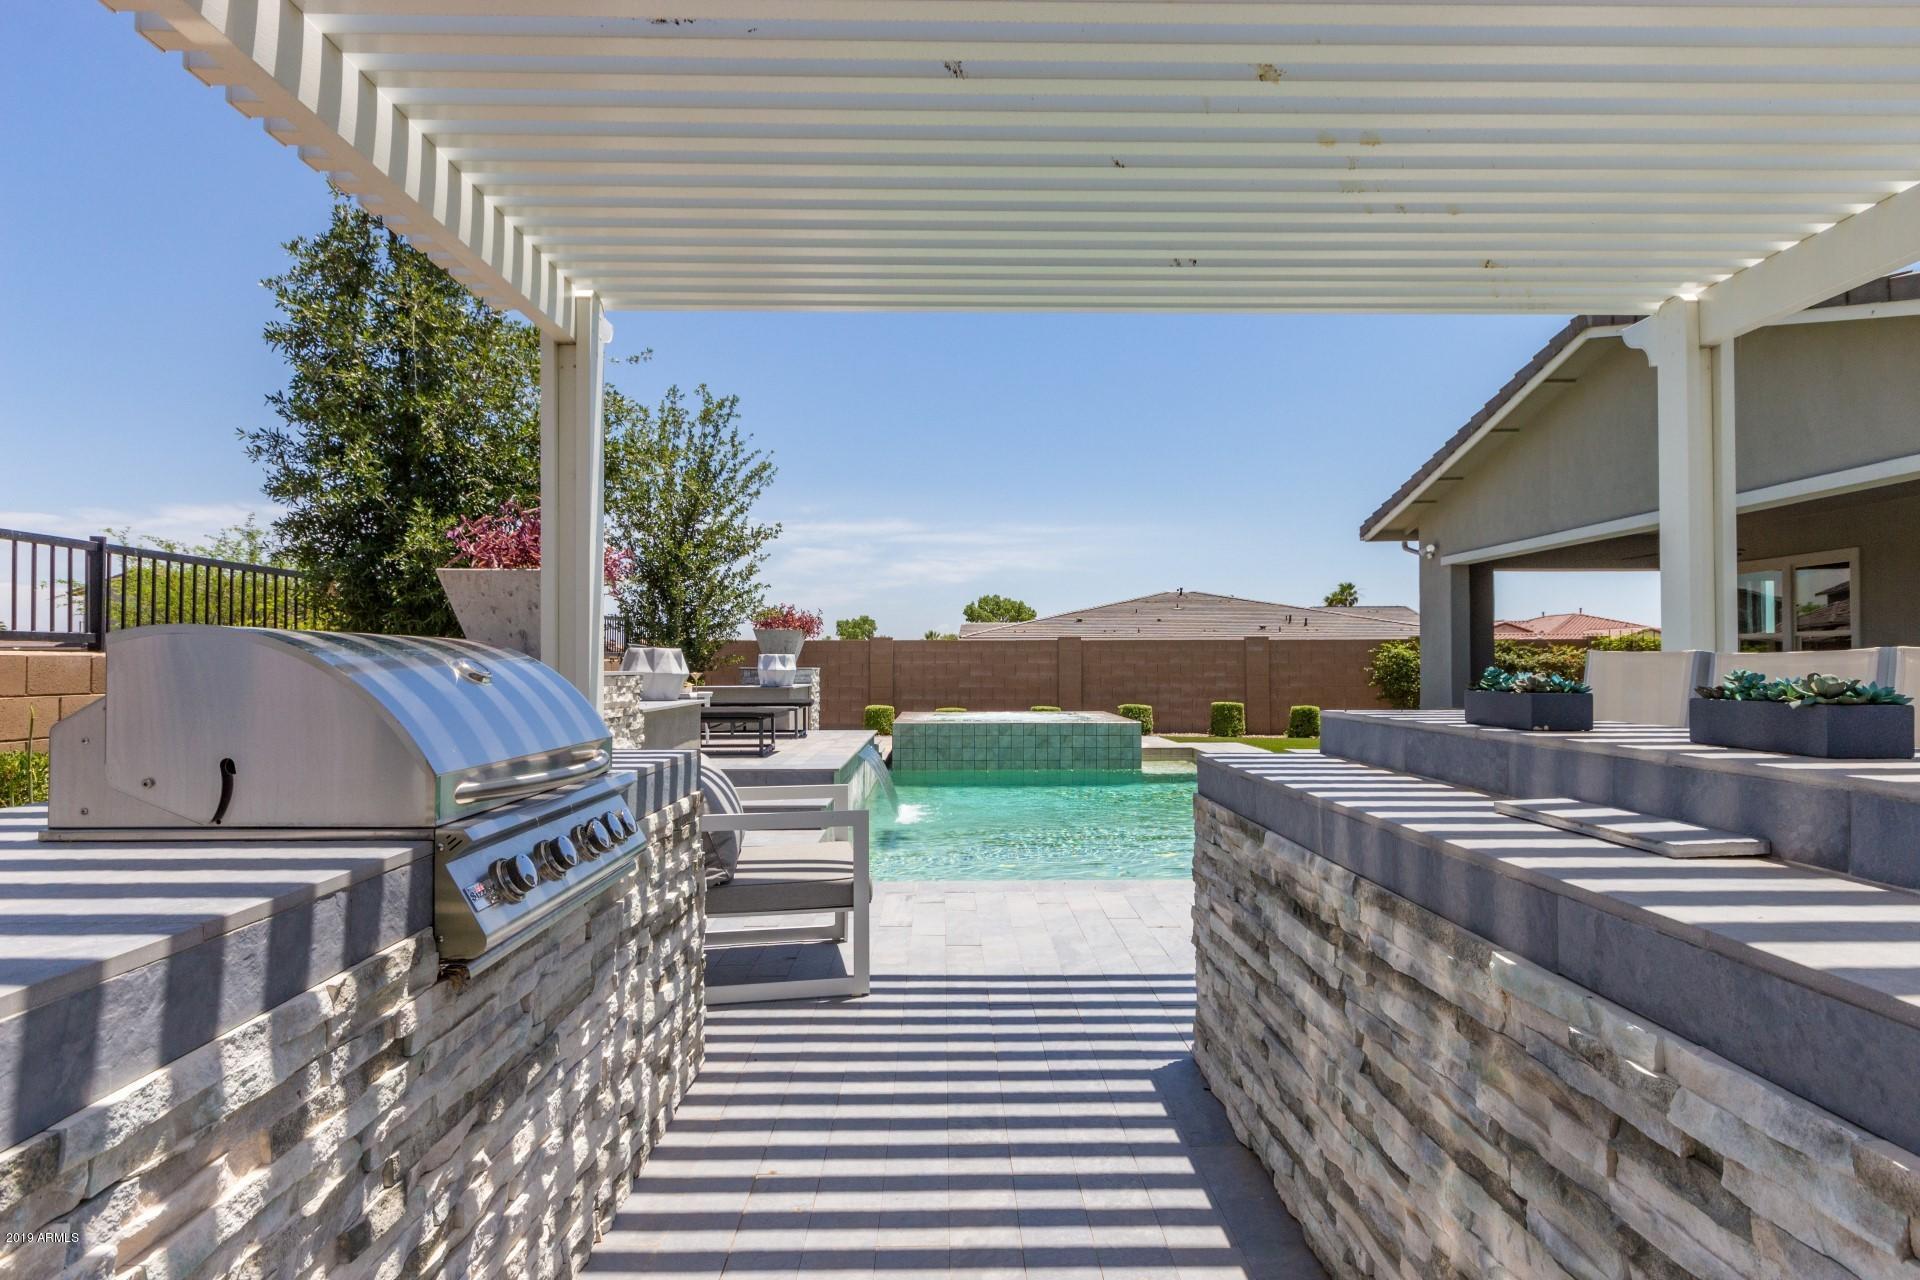 MLS 5972114 13756 W BLOOMINGTON Street, Litchfield Park, AZ 85340 Litchfield Park AZ Four Bedroom